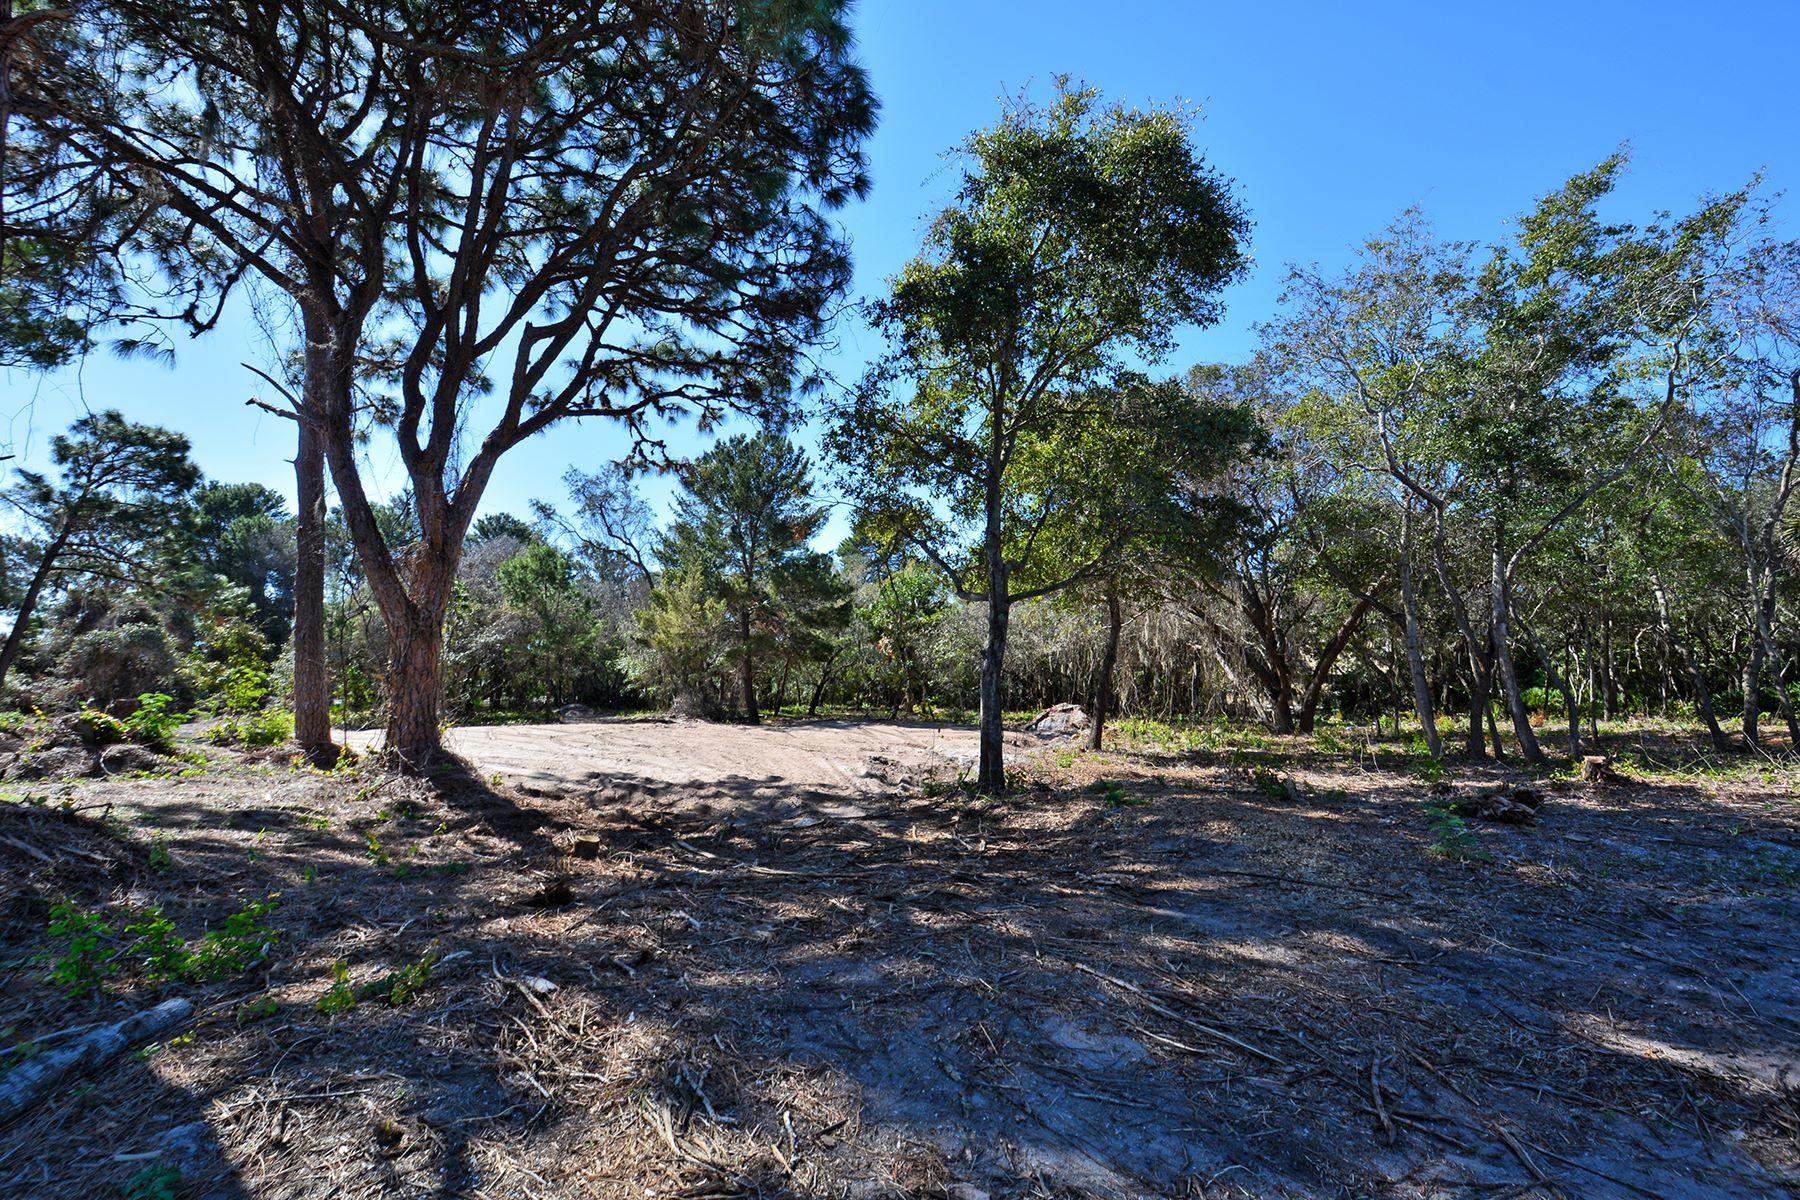 Land for Sale at BRADENTON 00 W 27th Ave 32, Bradenton, Florida 34209 United States